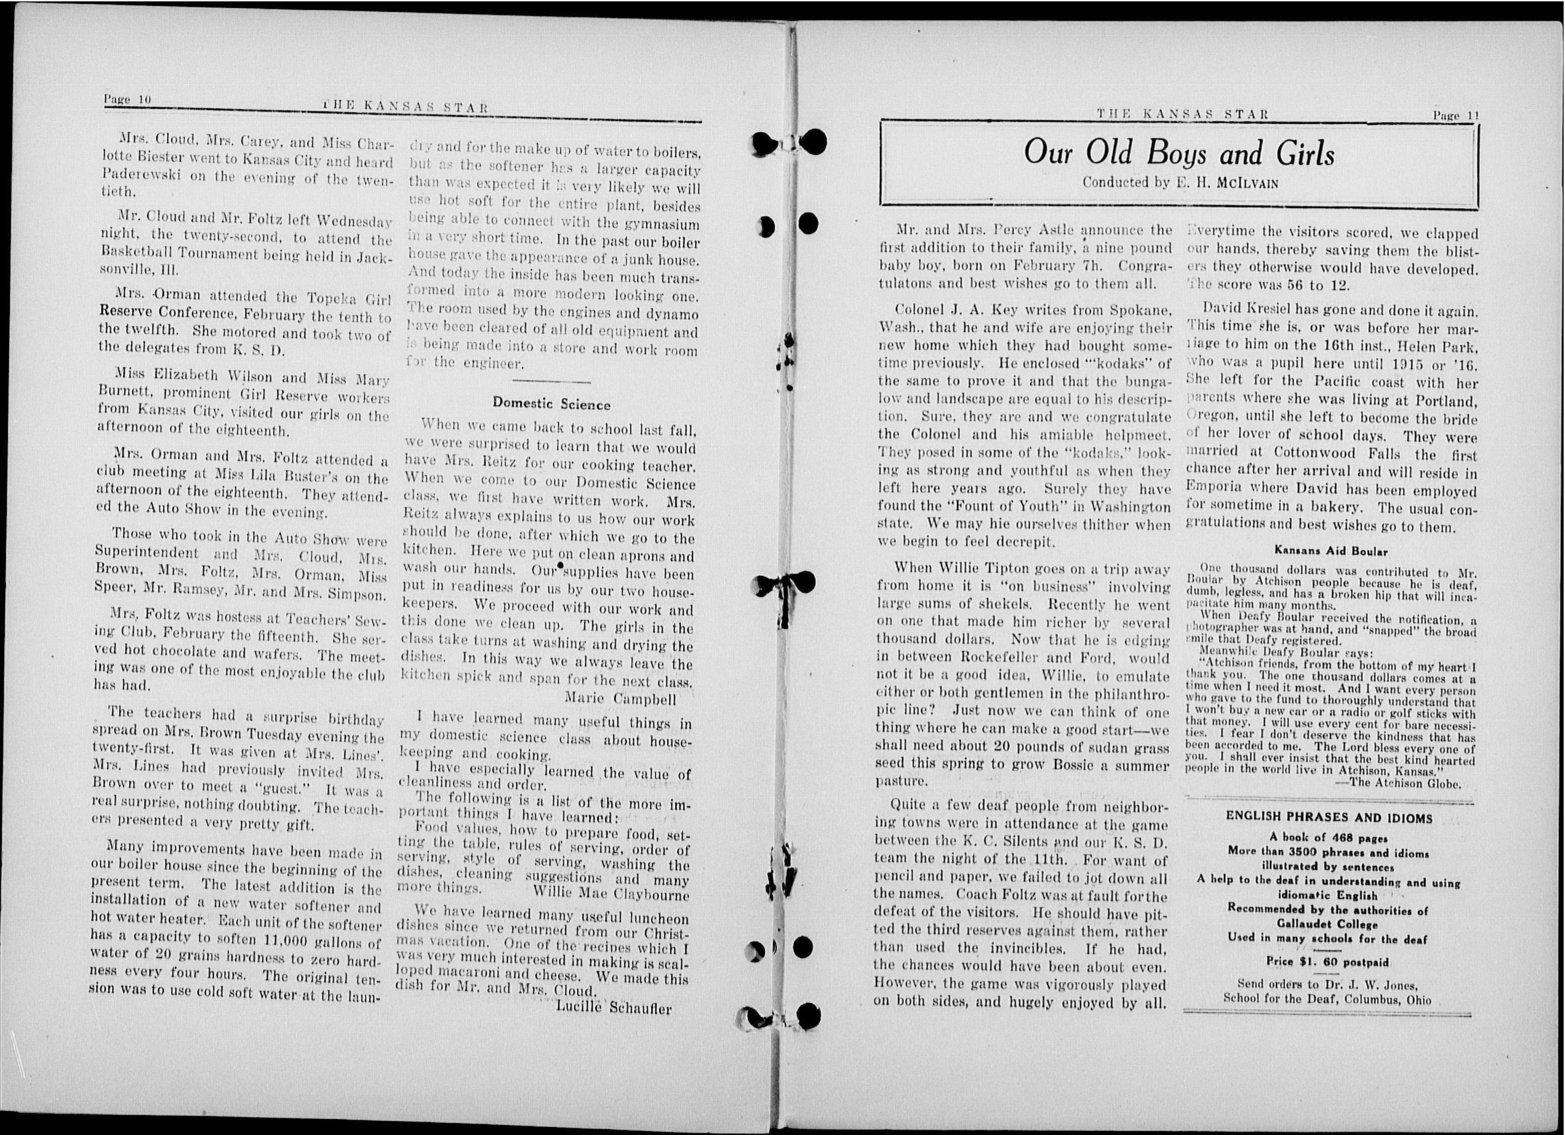 The Kansas Star, volume 51, number 8 - 10-11